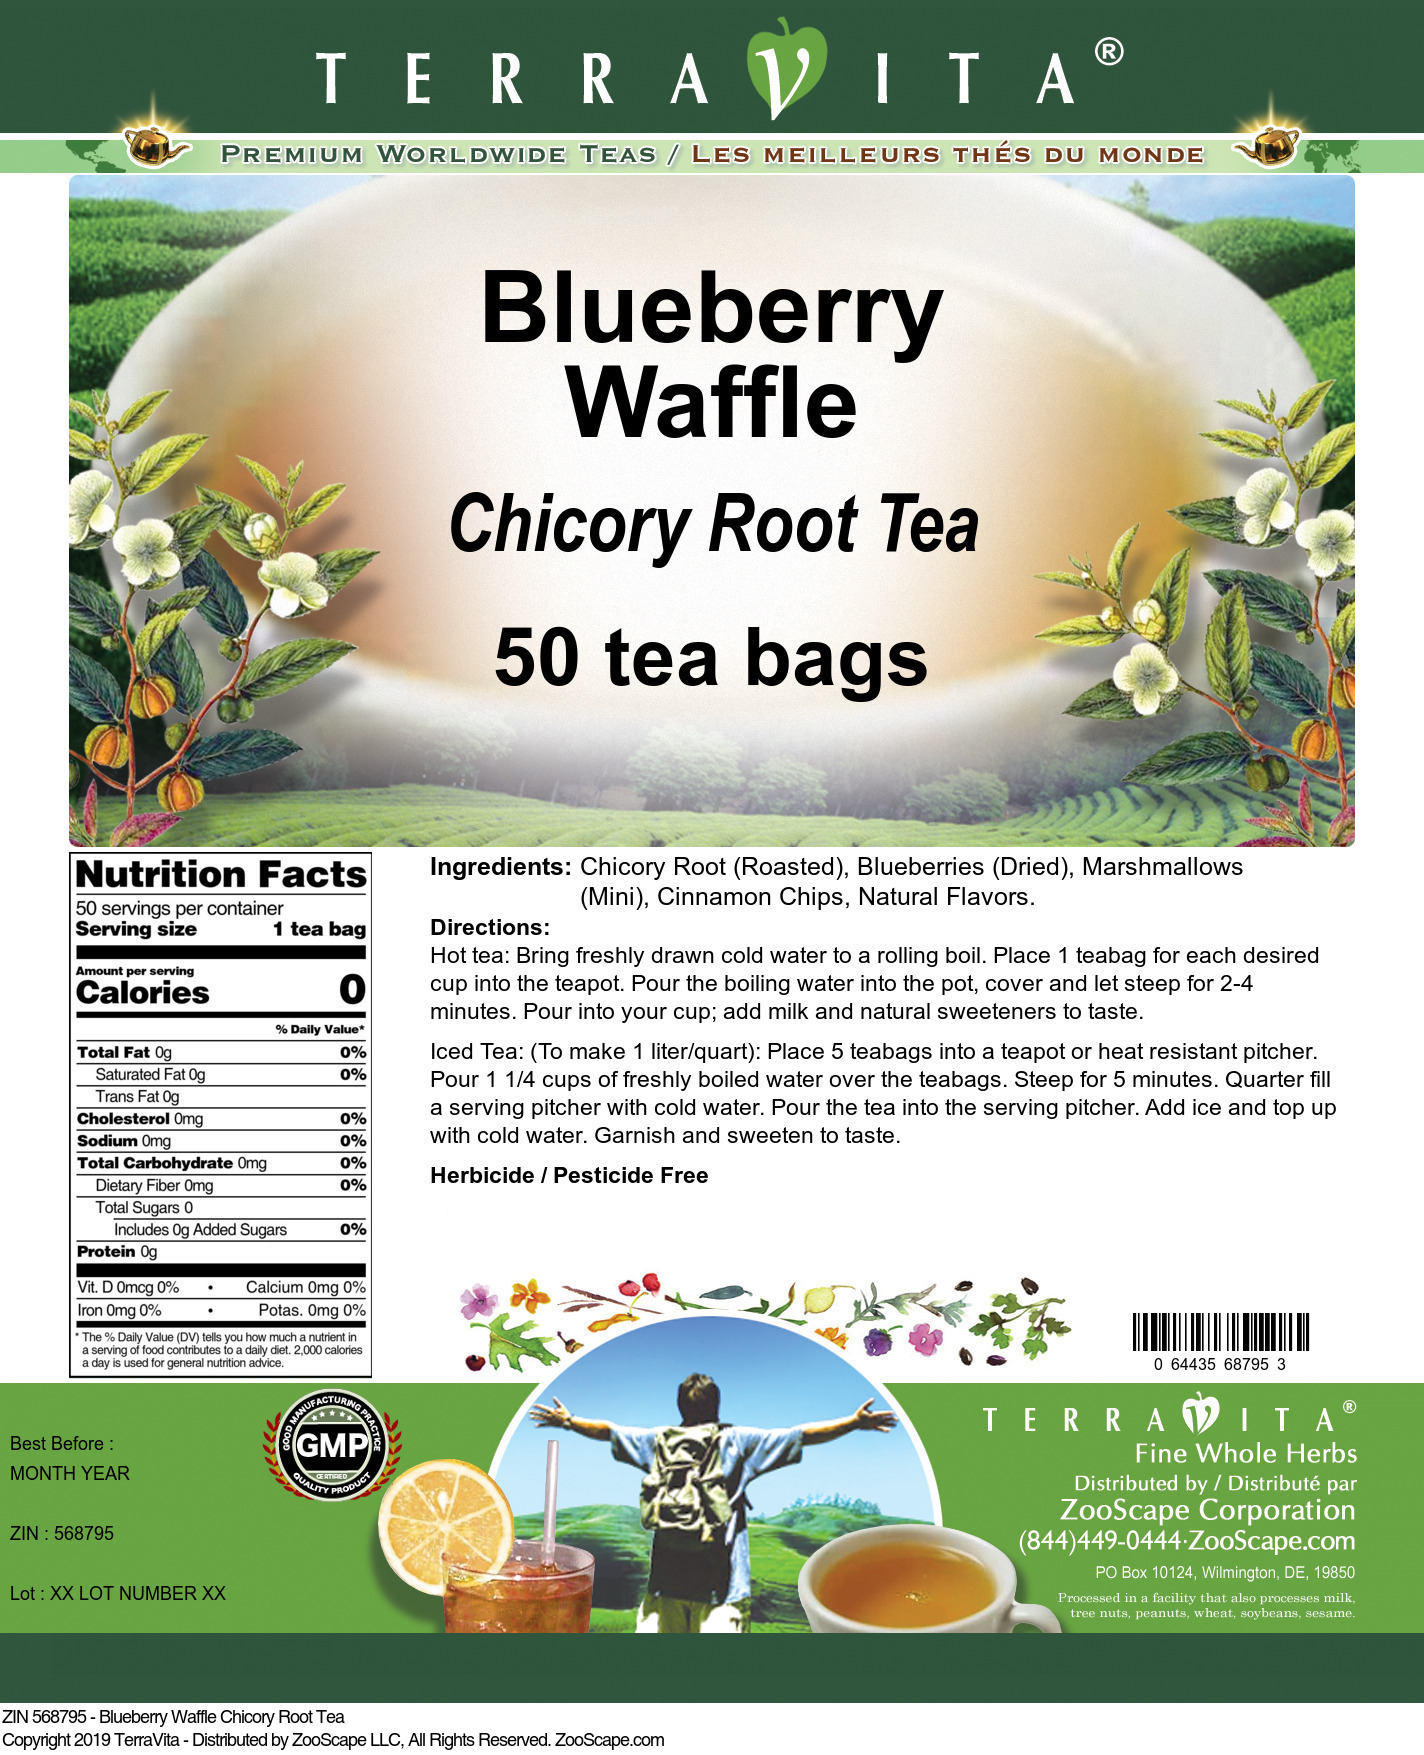 Blueberry Waffle Chicory Root